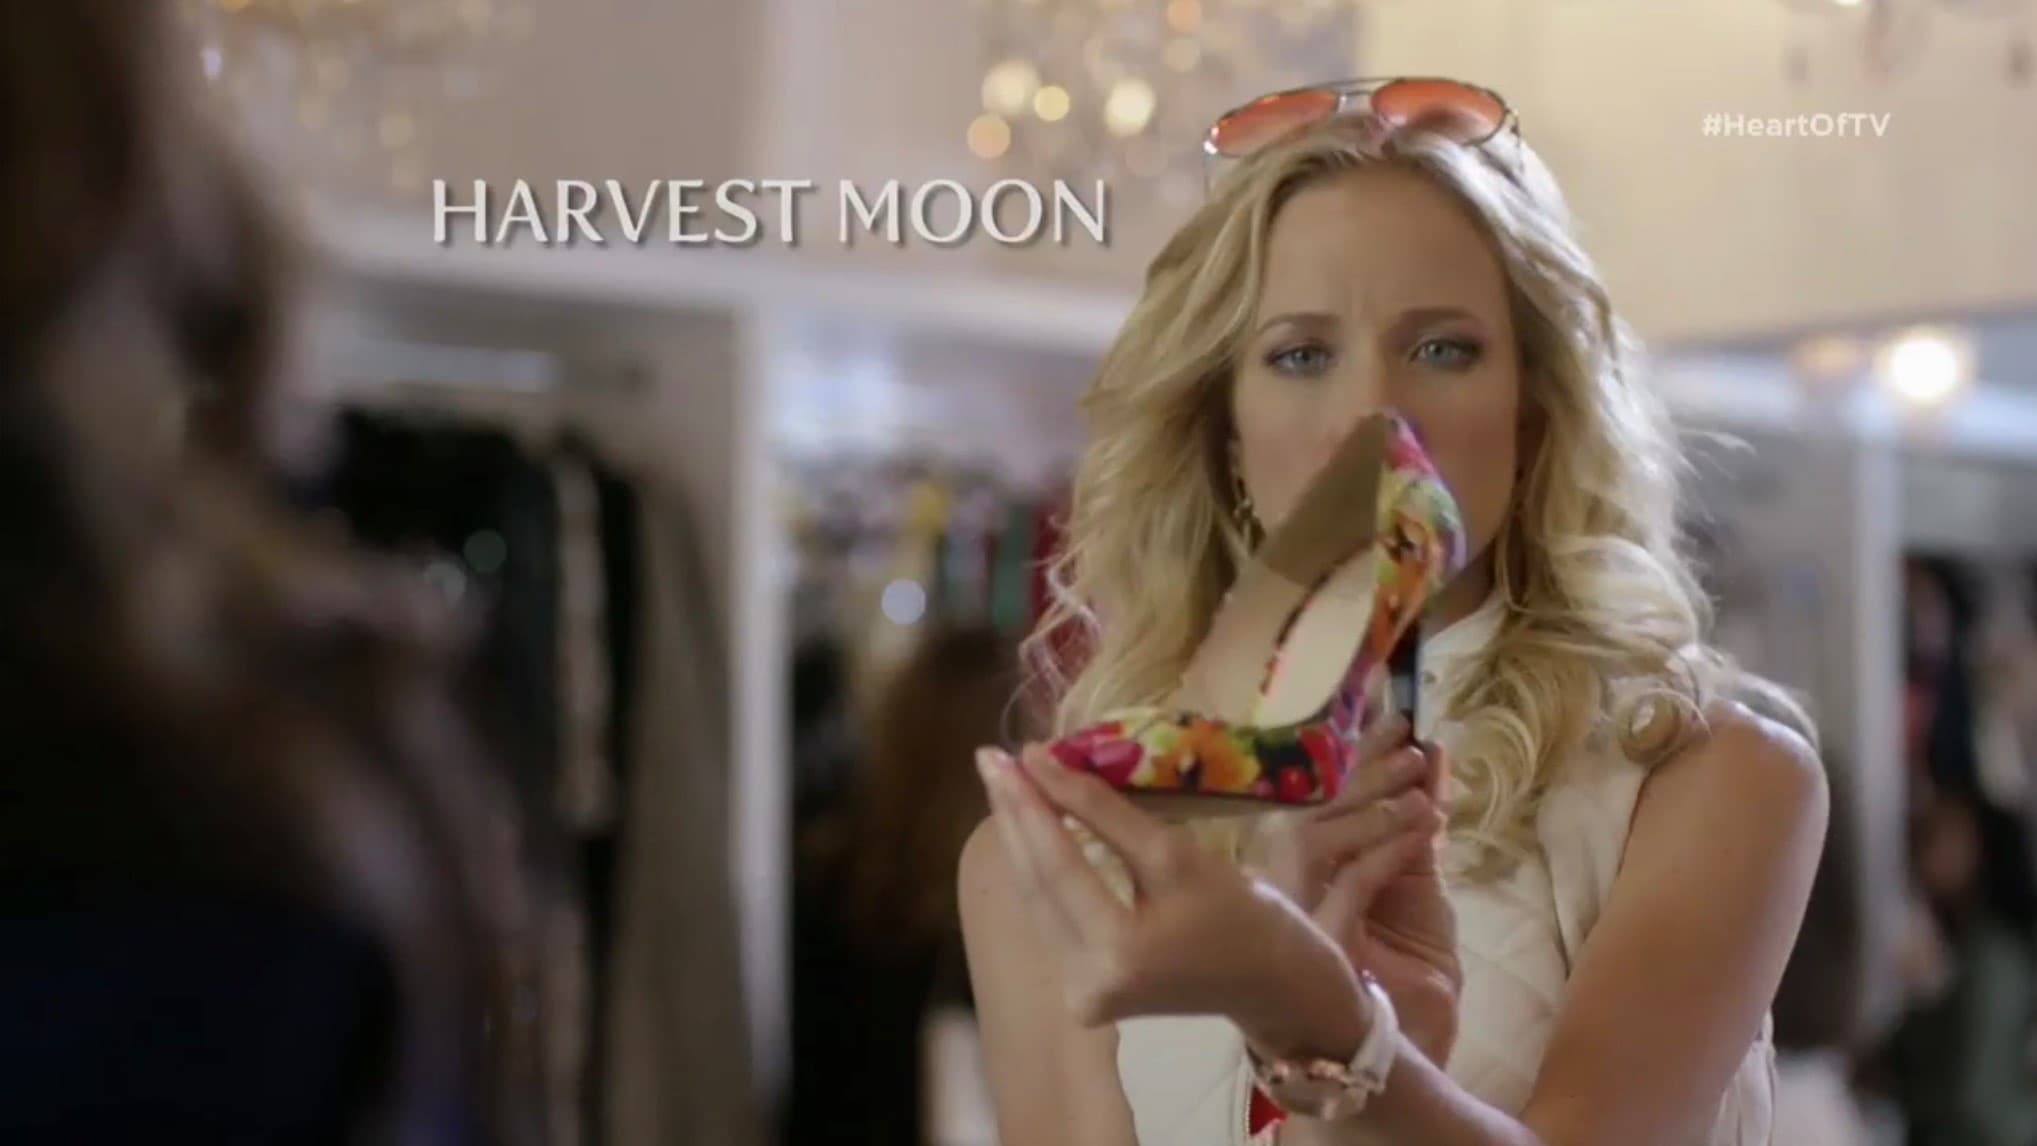 Regarder coup de foudre harvest moon film en streaming - Regarder coup de foudre a bollywood en streaming ...